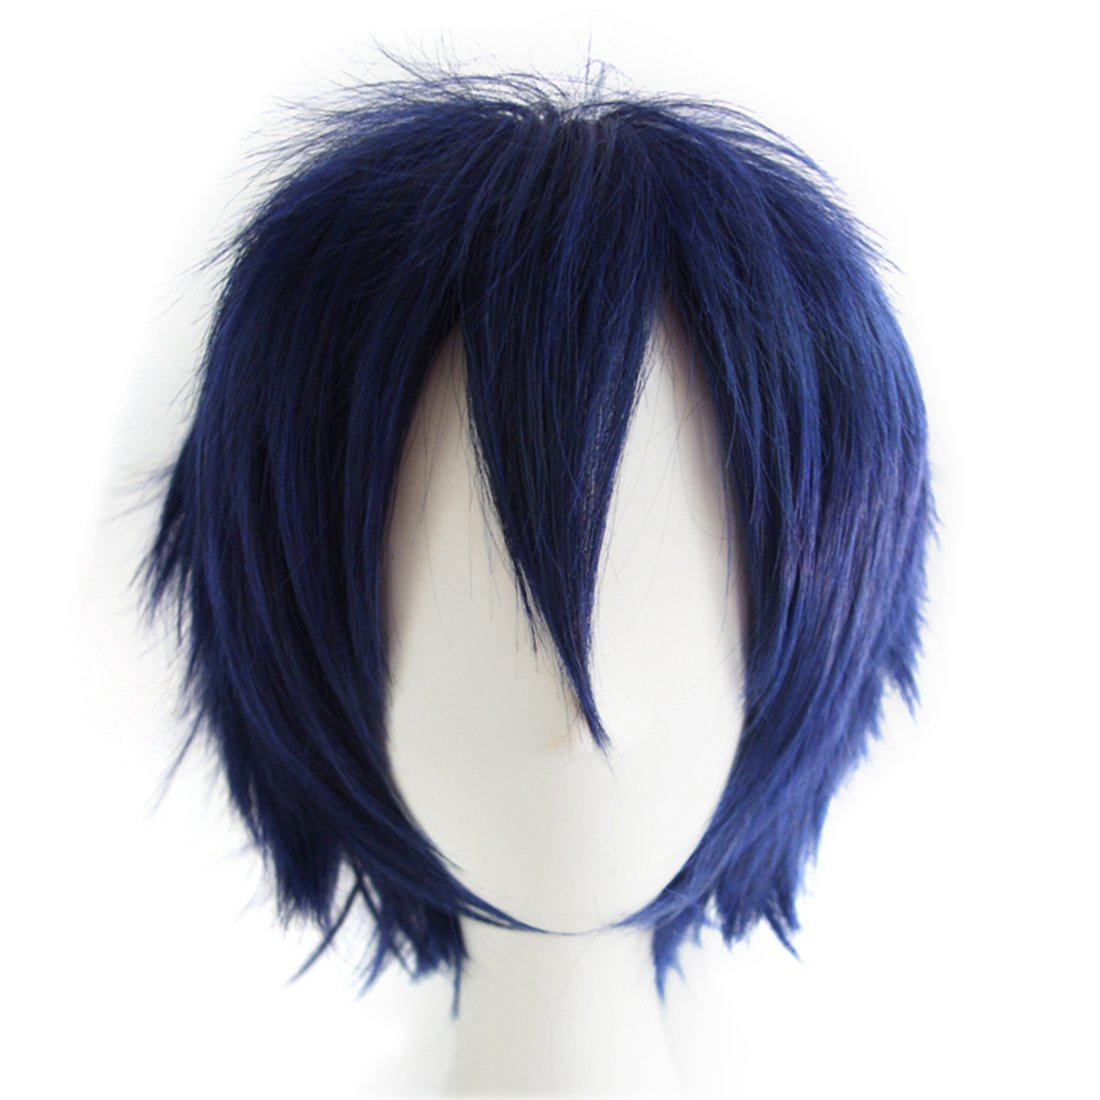 Alacos Fashion Dark Blue Short Straight Layered Unisex Cosplay Wig Anime Wig Layered Hair + Wig Cap